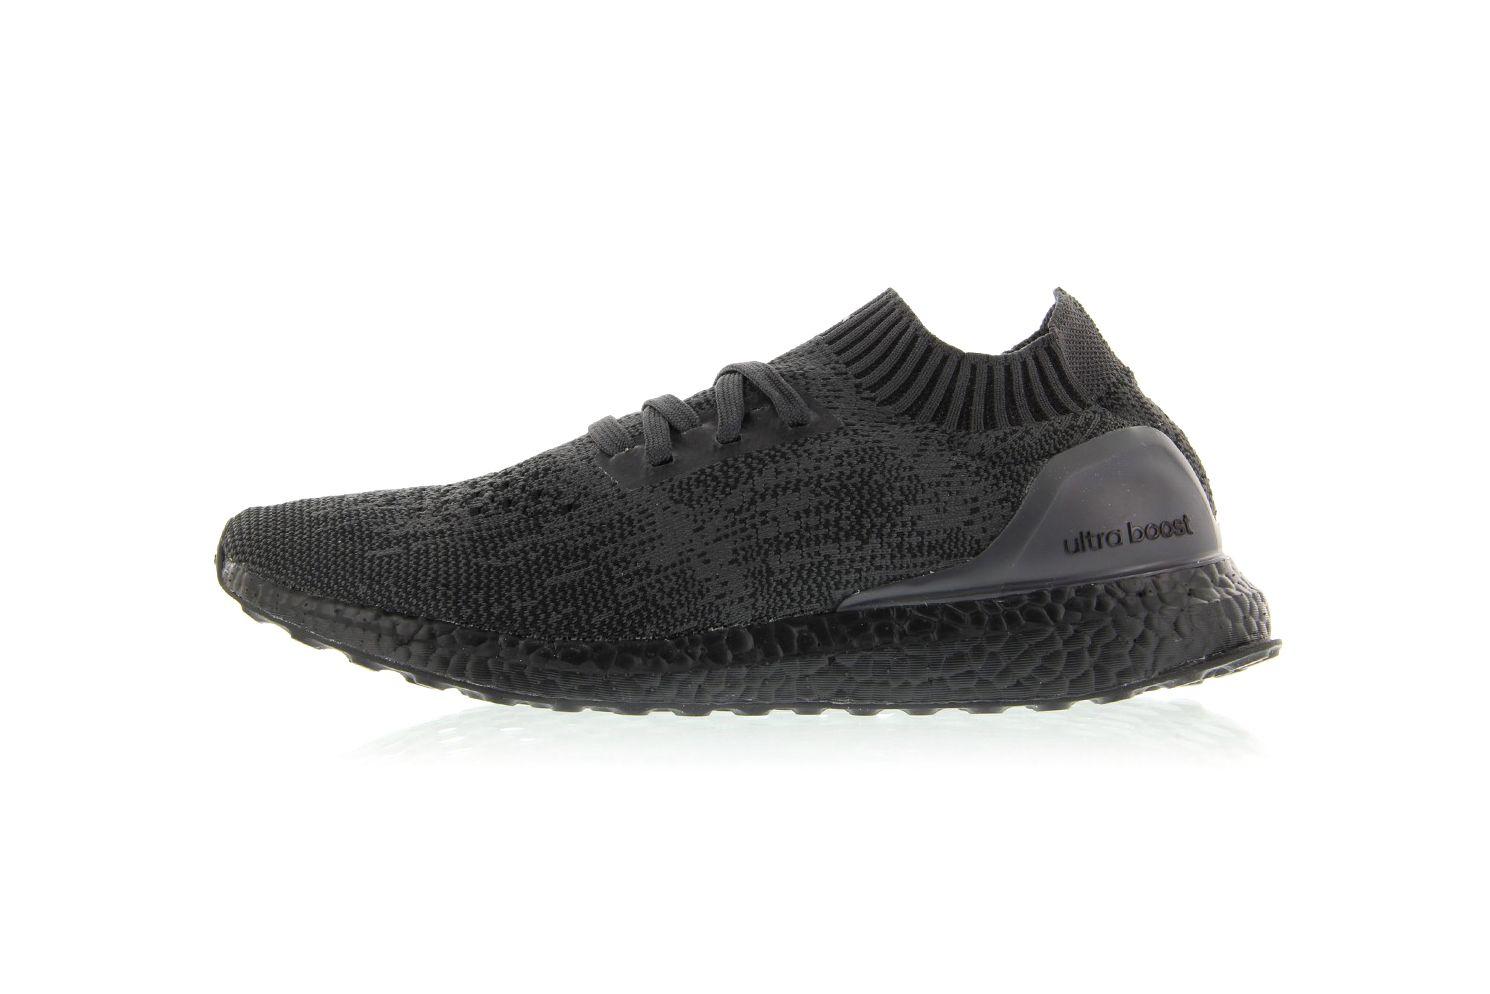 Schön Hohe Qualität Adidas Ultra Boost Schuhe Uncage